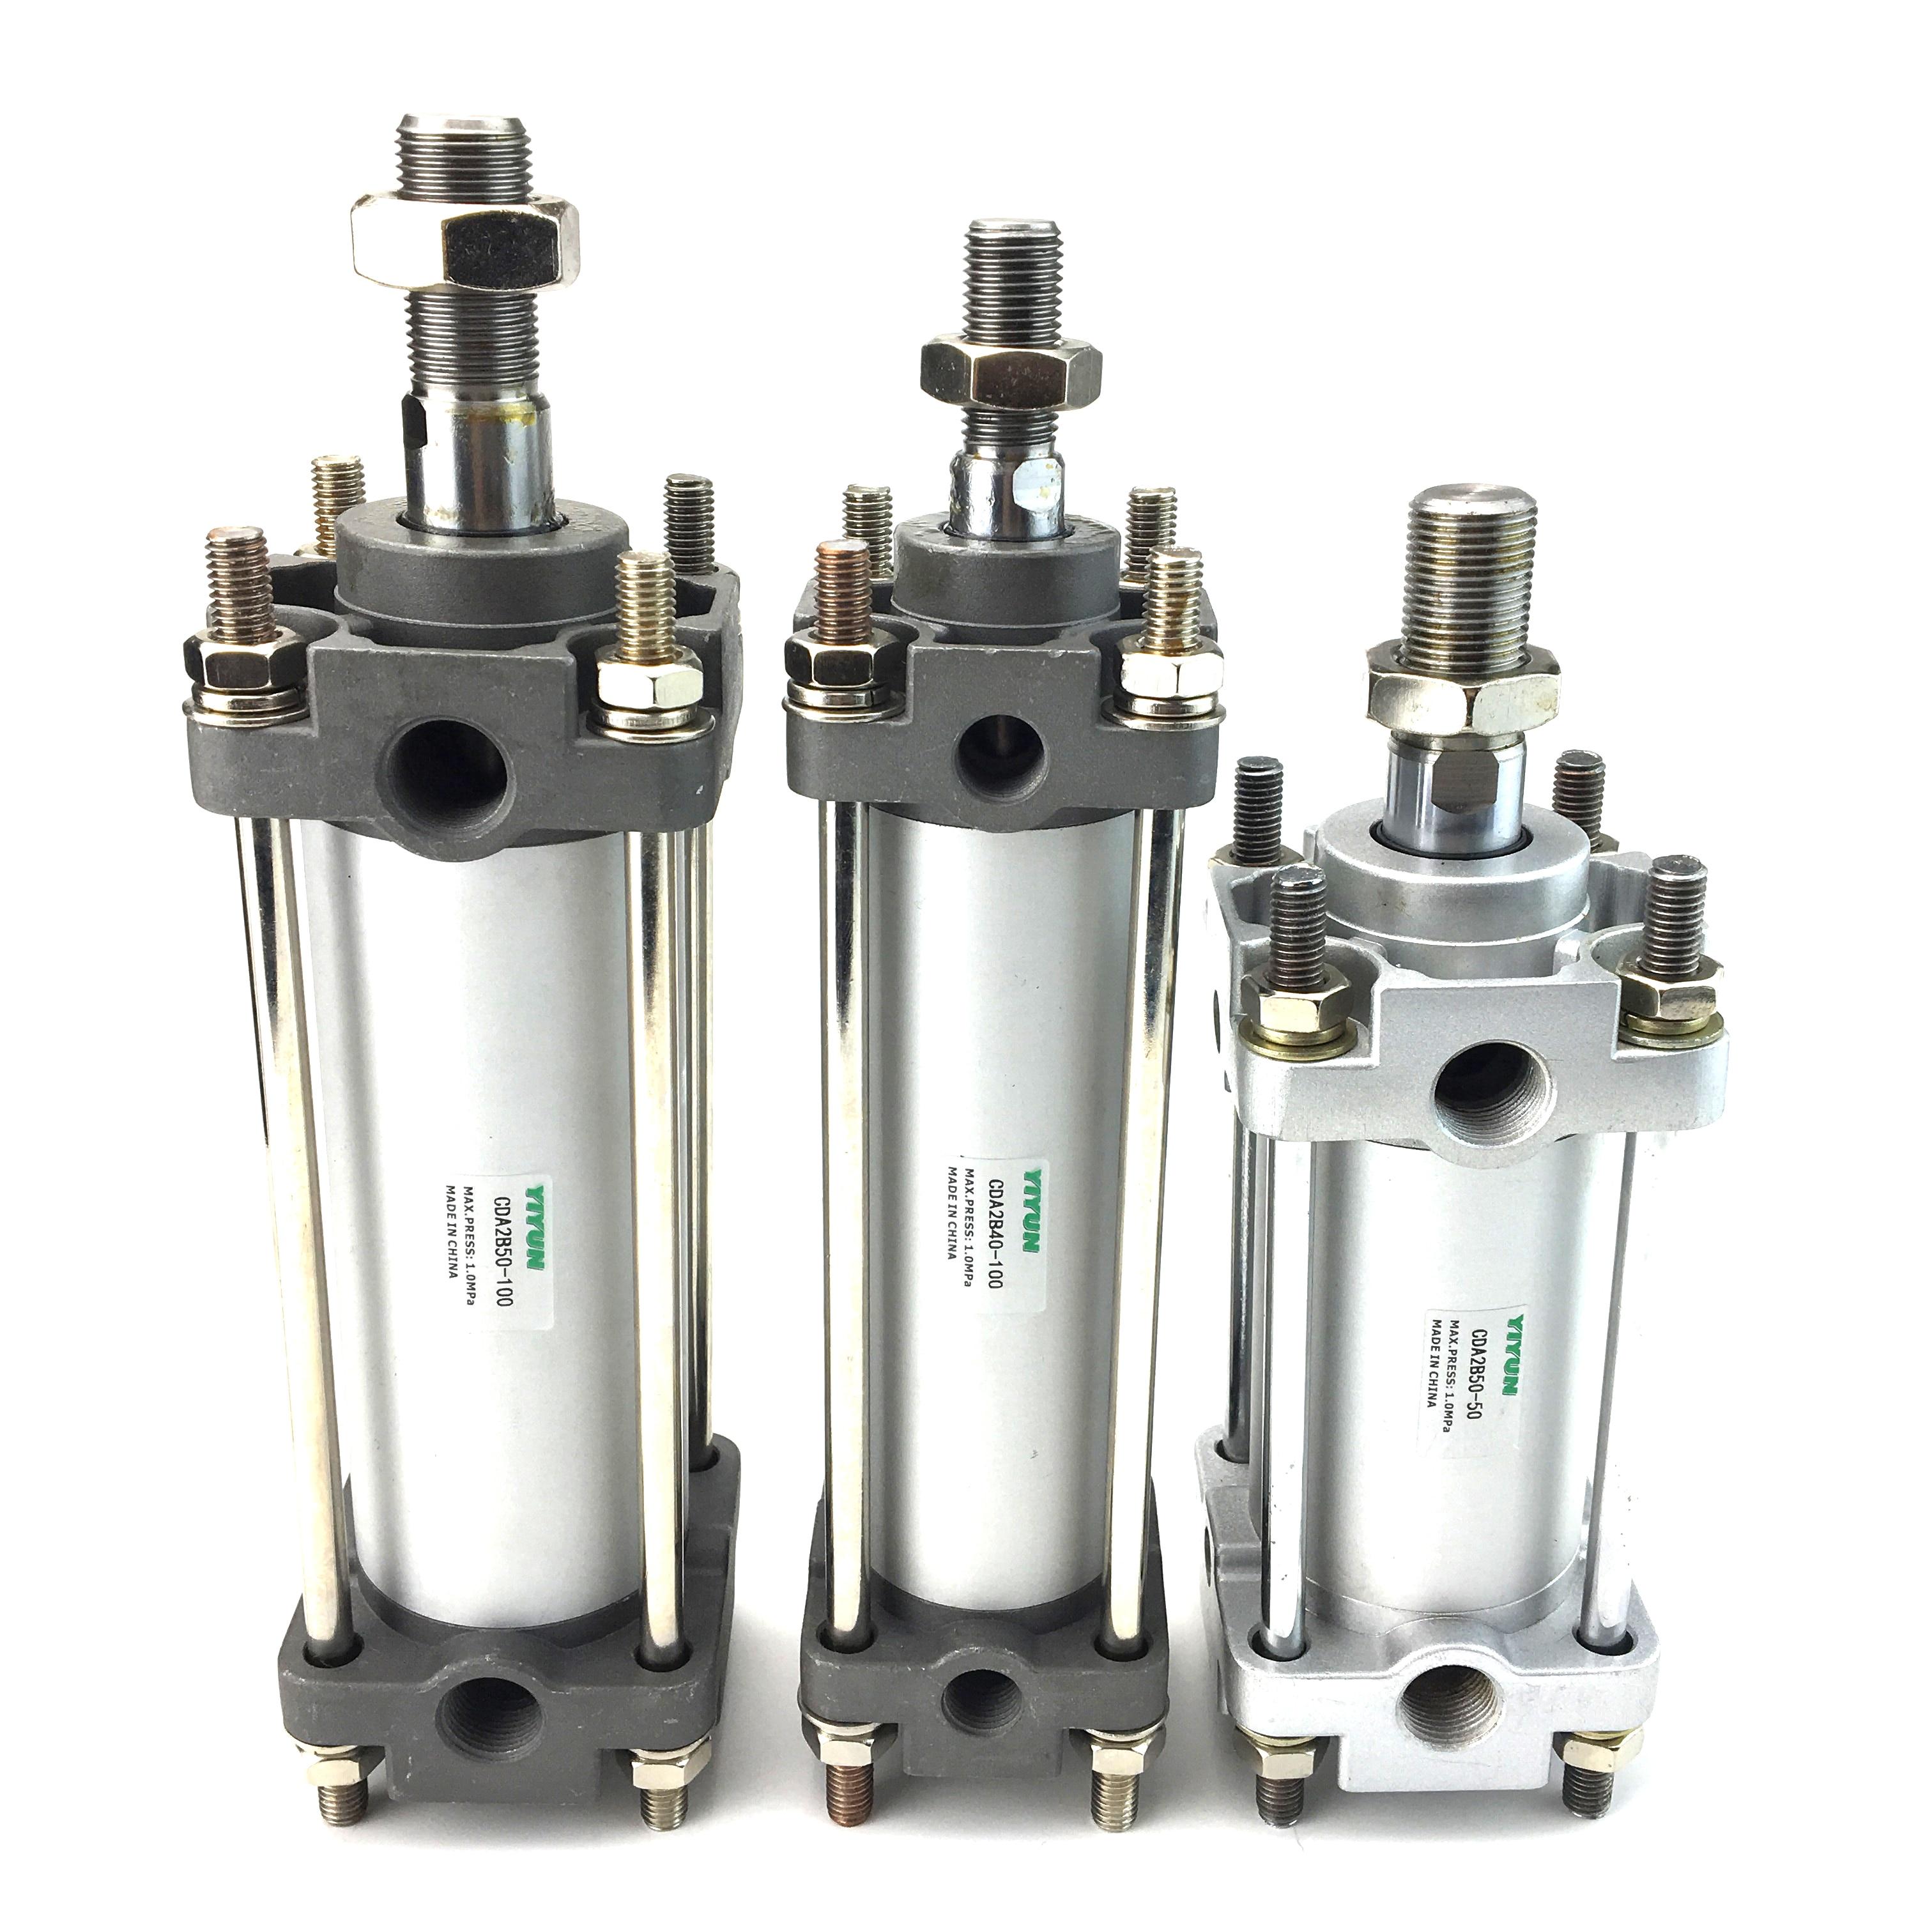 CDA2B40-500/500Z/600/600Z/700/700Z/800/800Z/900/900Z/1000/1000Z cilindro neumático estándar YIYUN, serie CDA2B